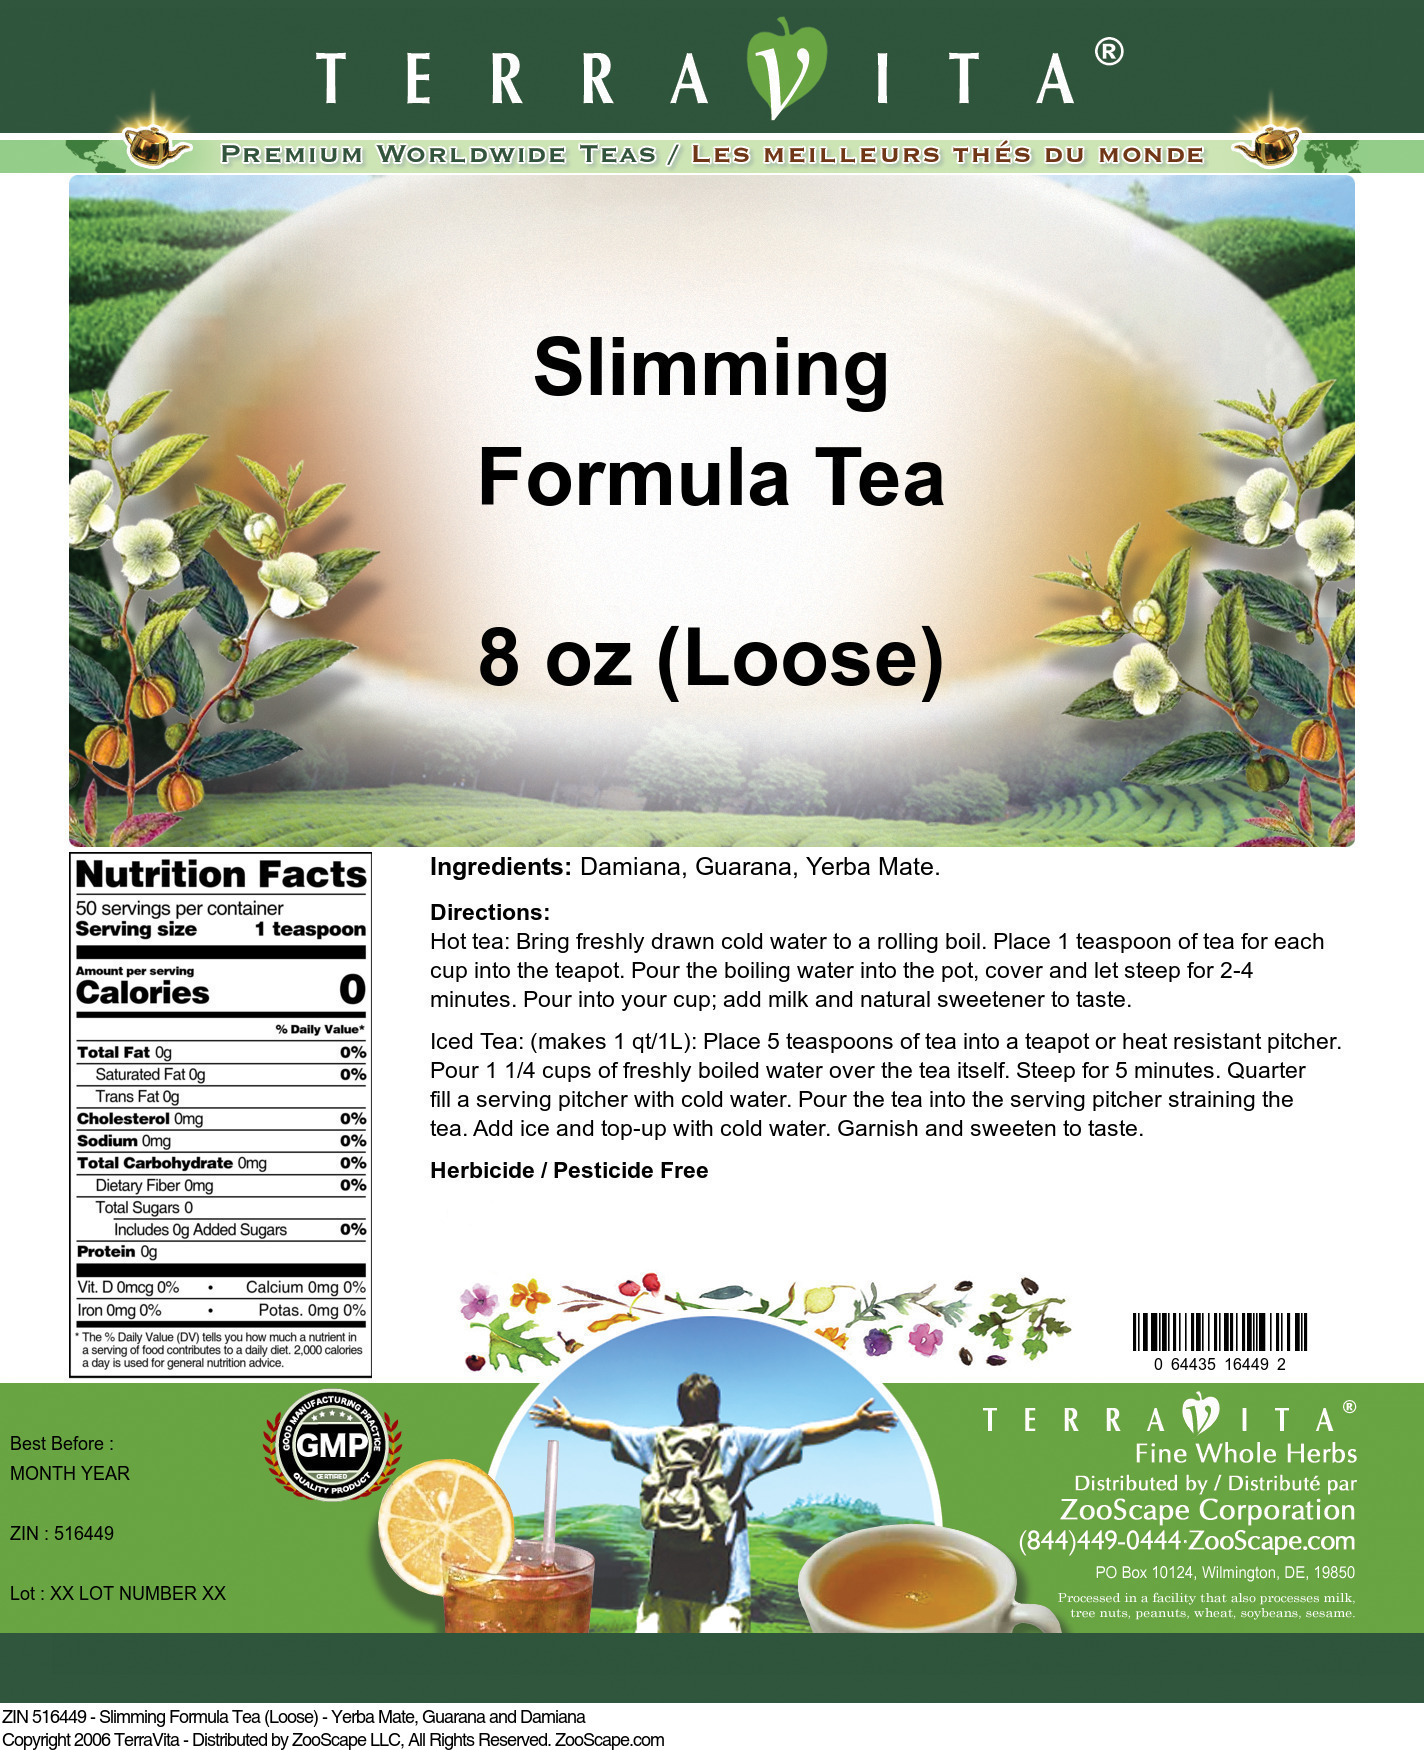 Slimming Formula